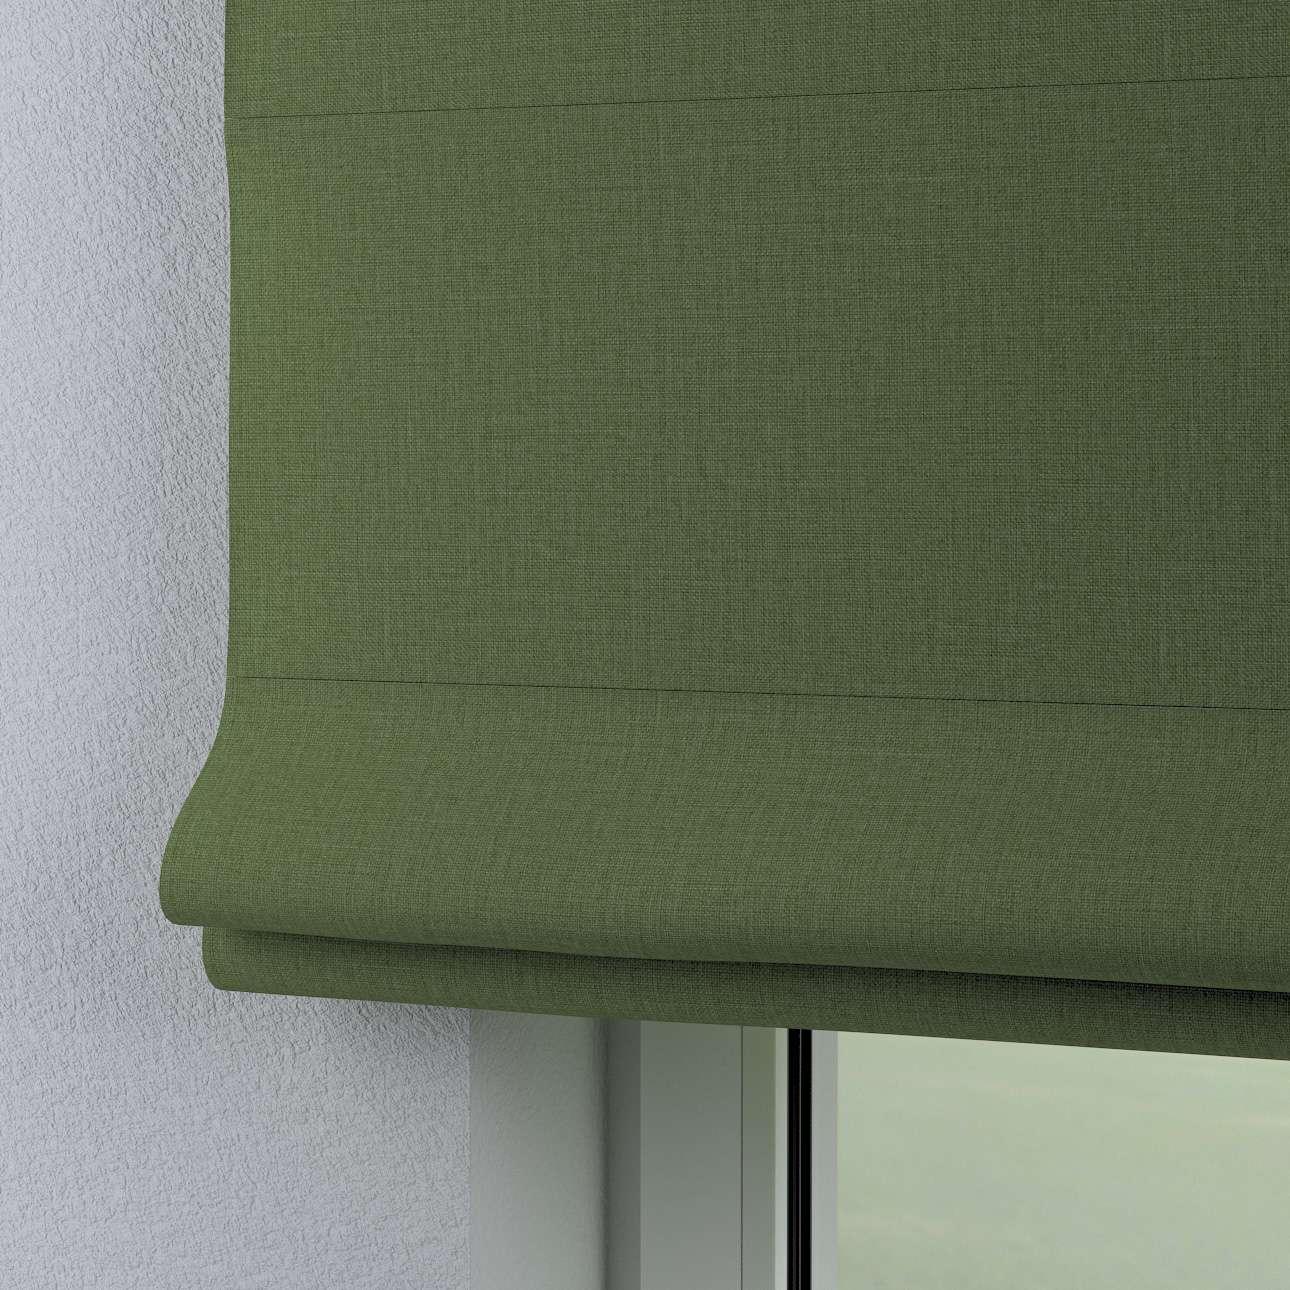 Rímska roleta Capri V kolekcii Blackout 280 cm, tkanina: 269-15